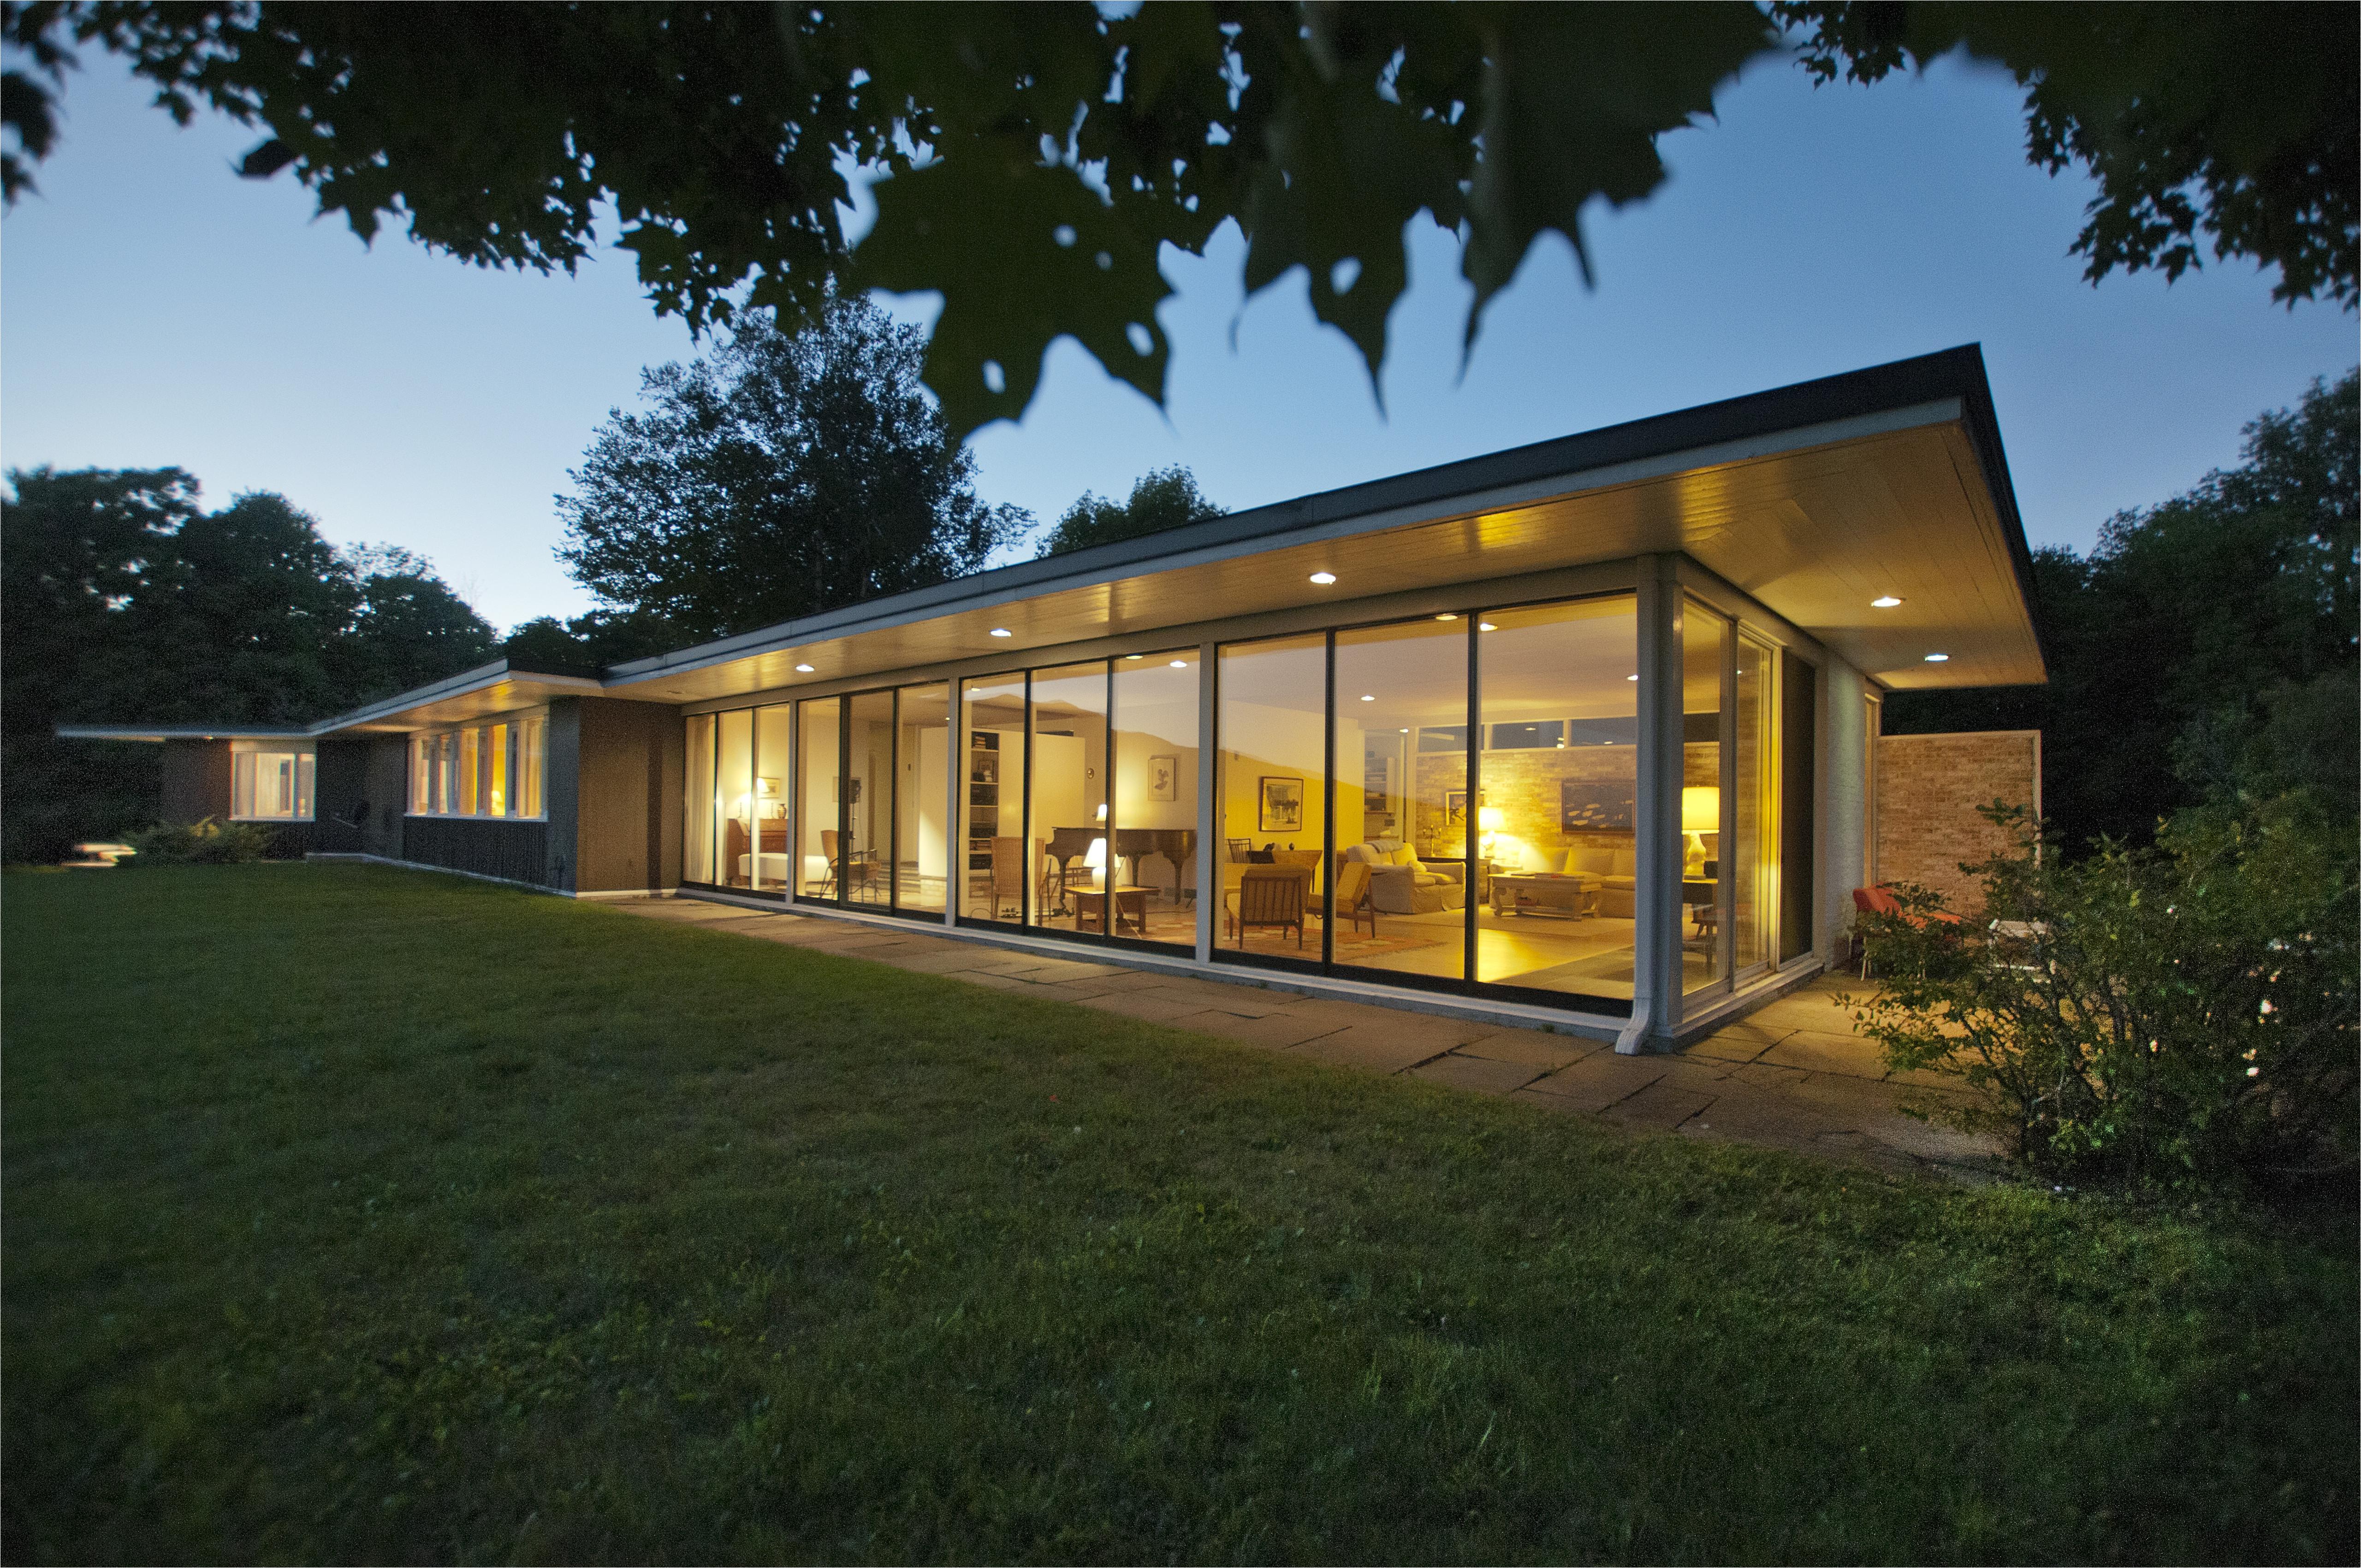 midcentury modern on 135 acres asks 1 2m